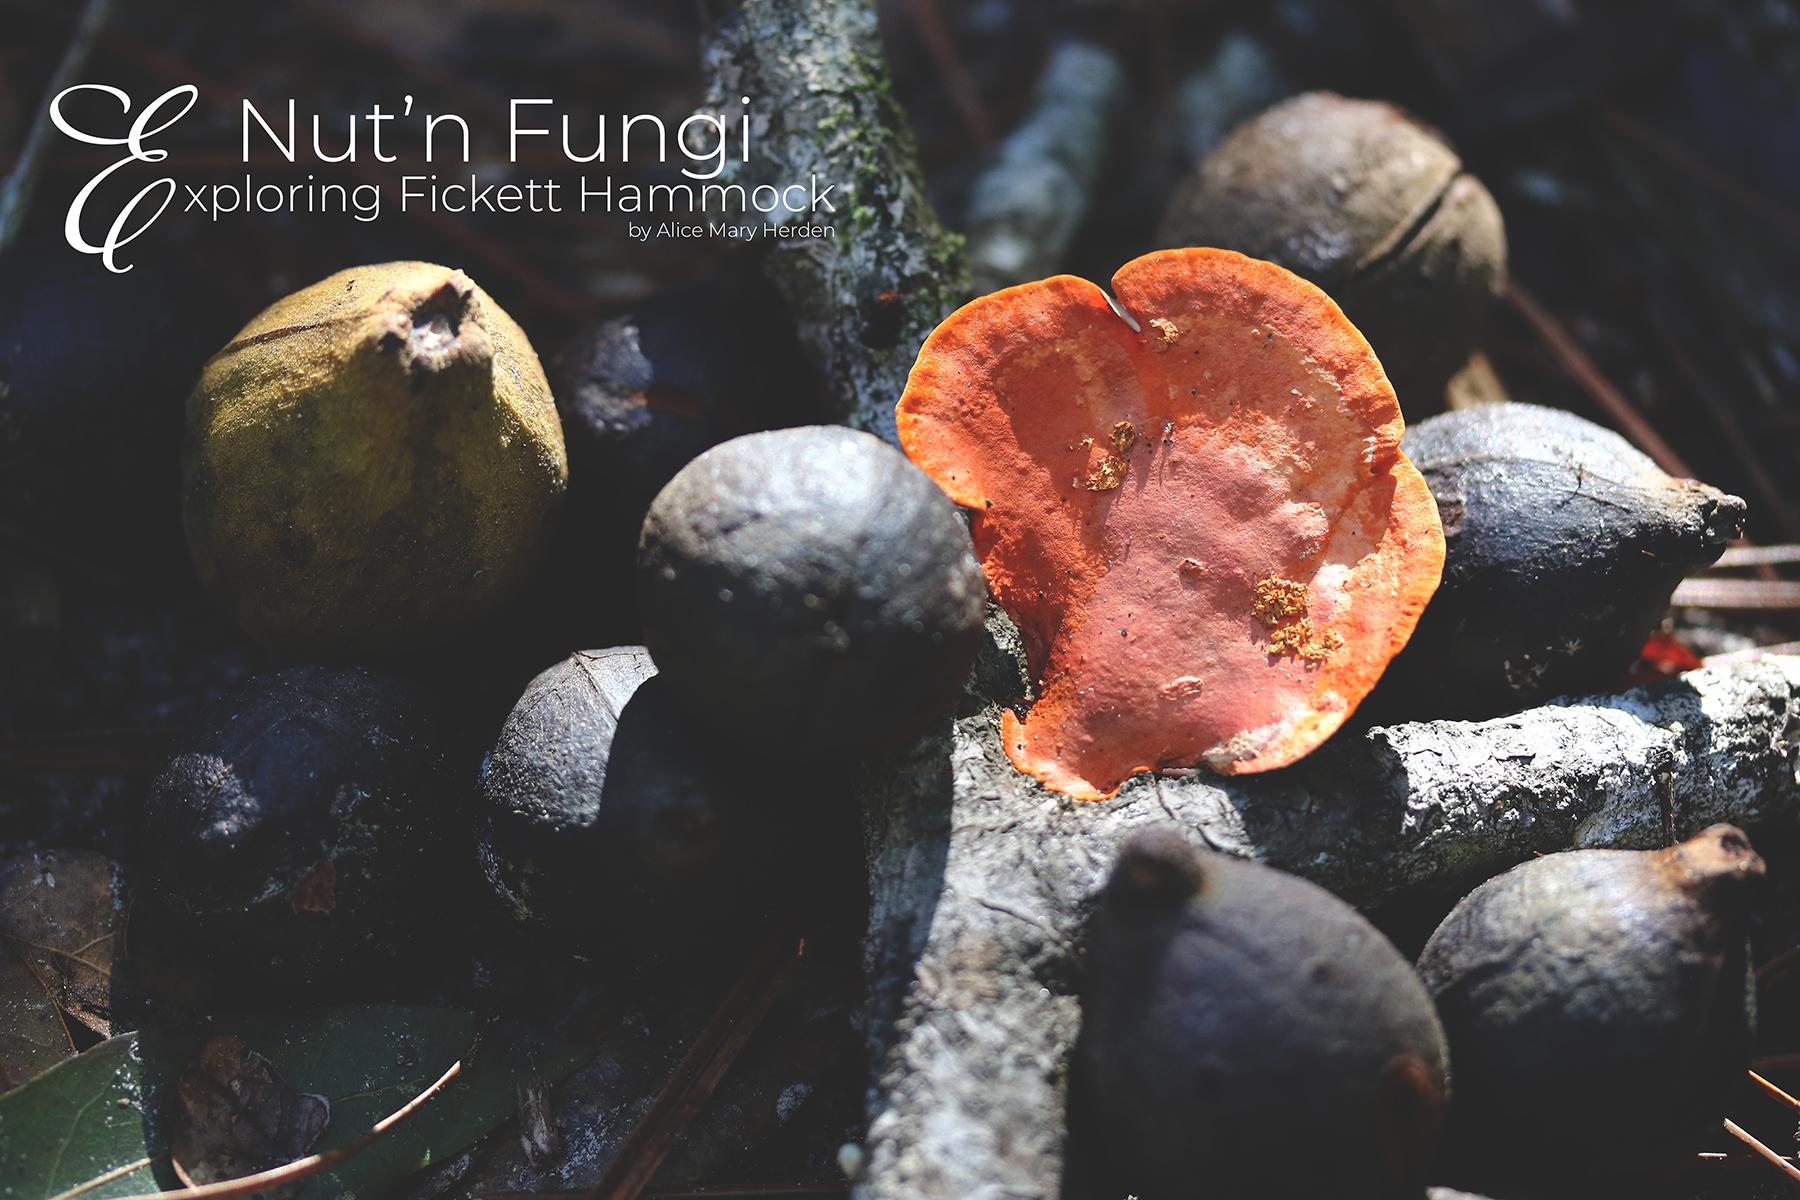 Nut'n Fungi- Exploring Fickett Hammock